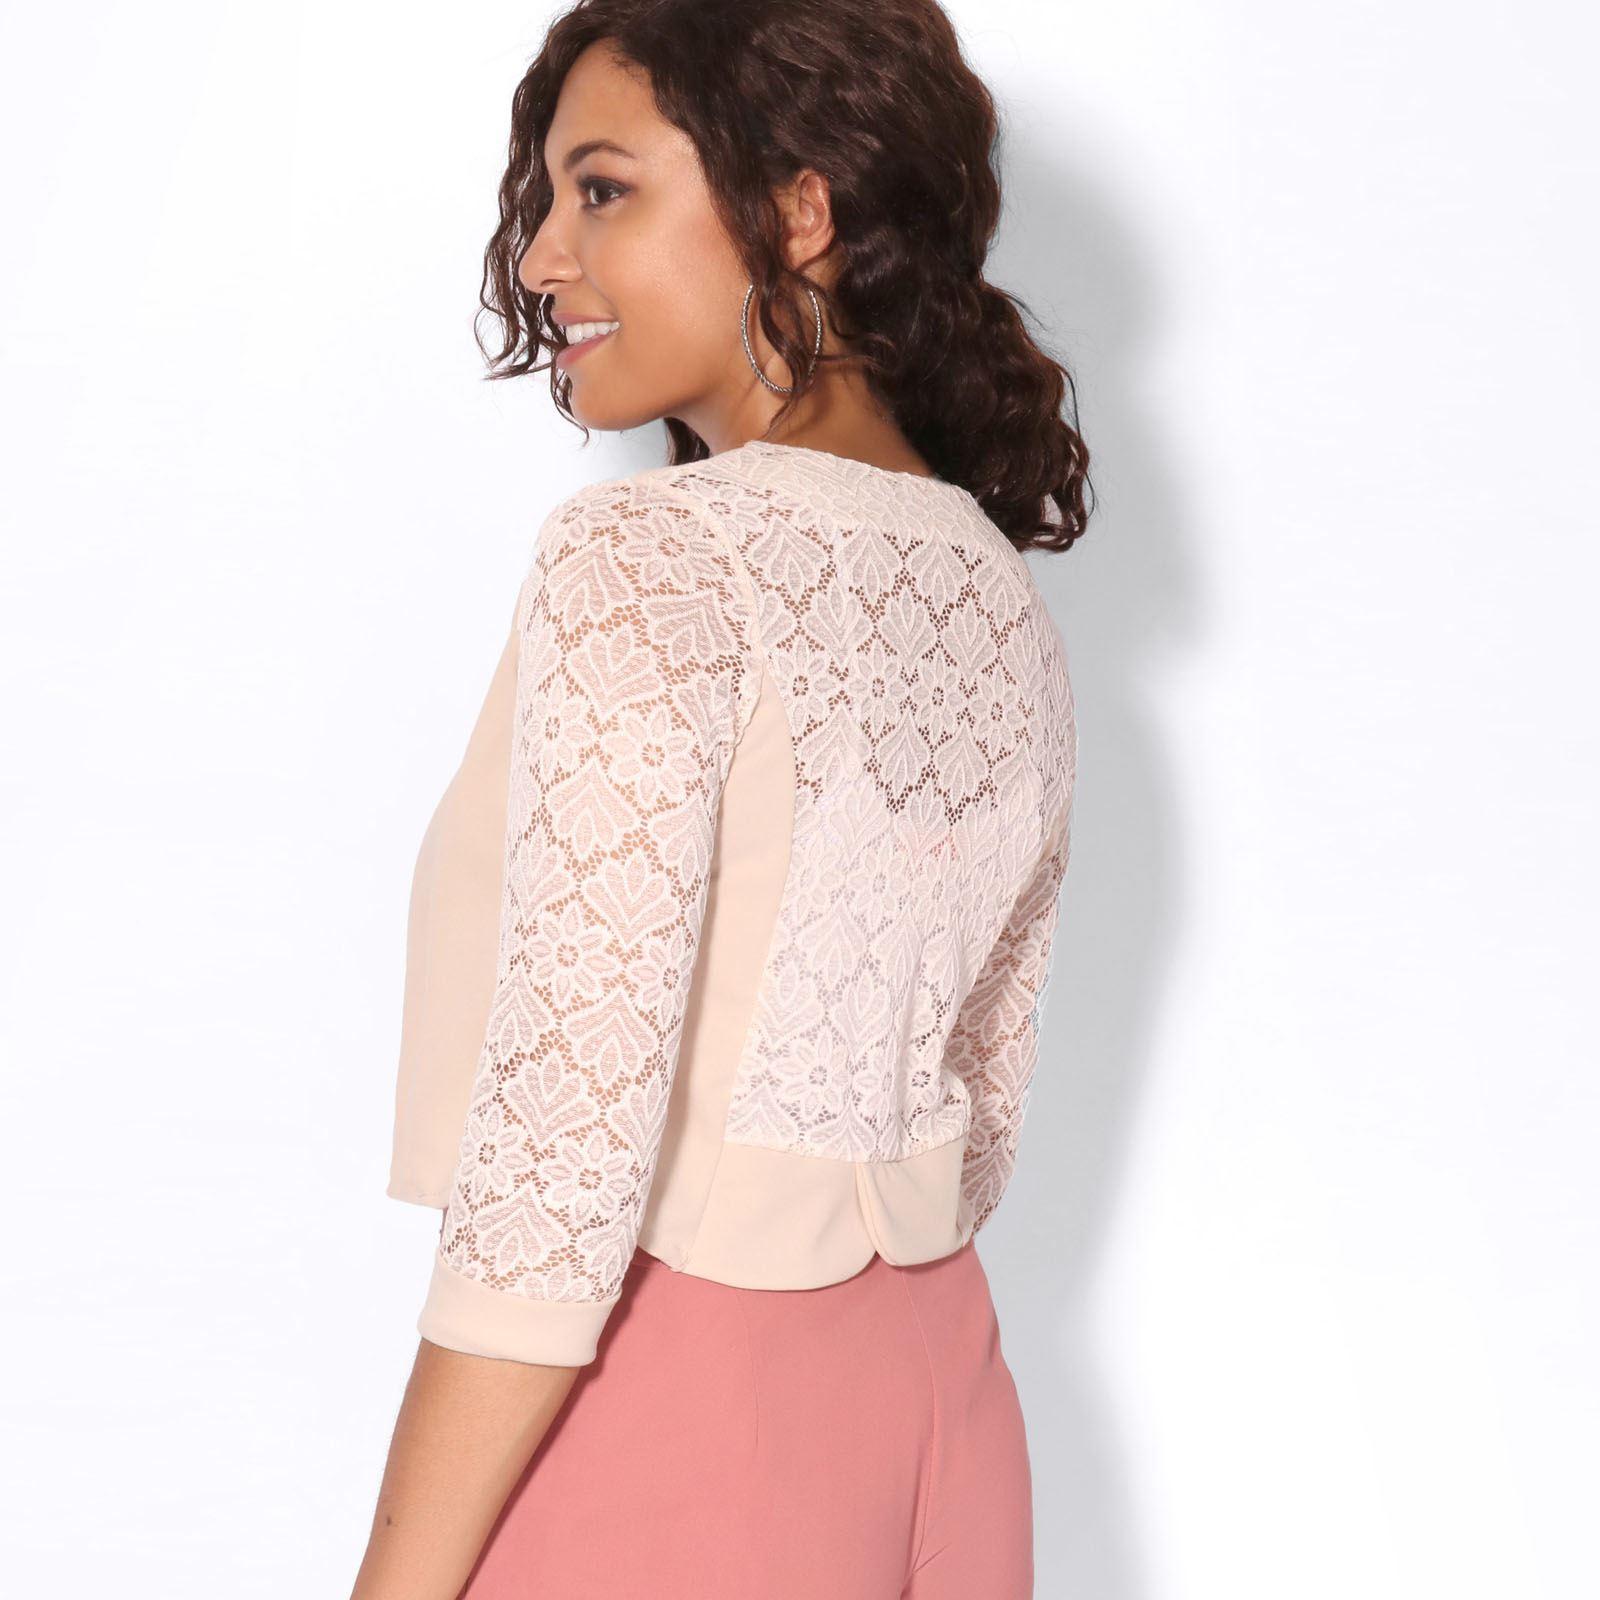 Womens-Ladies-Bolero-Lace-Shrug-Short-Sleeve-Cardigan-Cropped-Party-Top-Jacket thumbnail 21